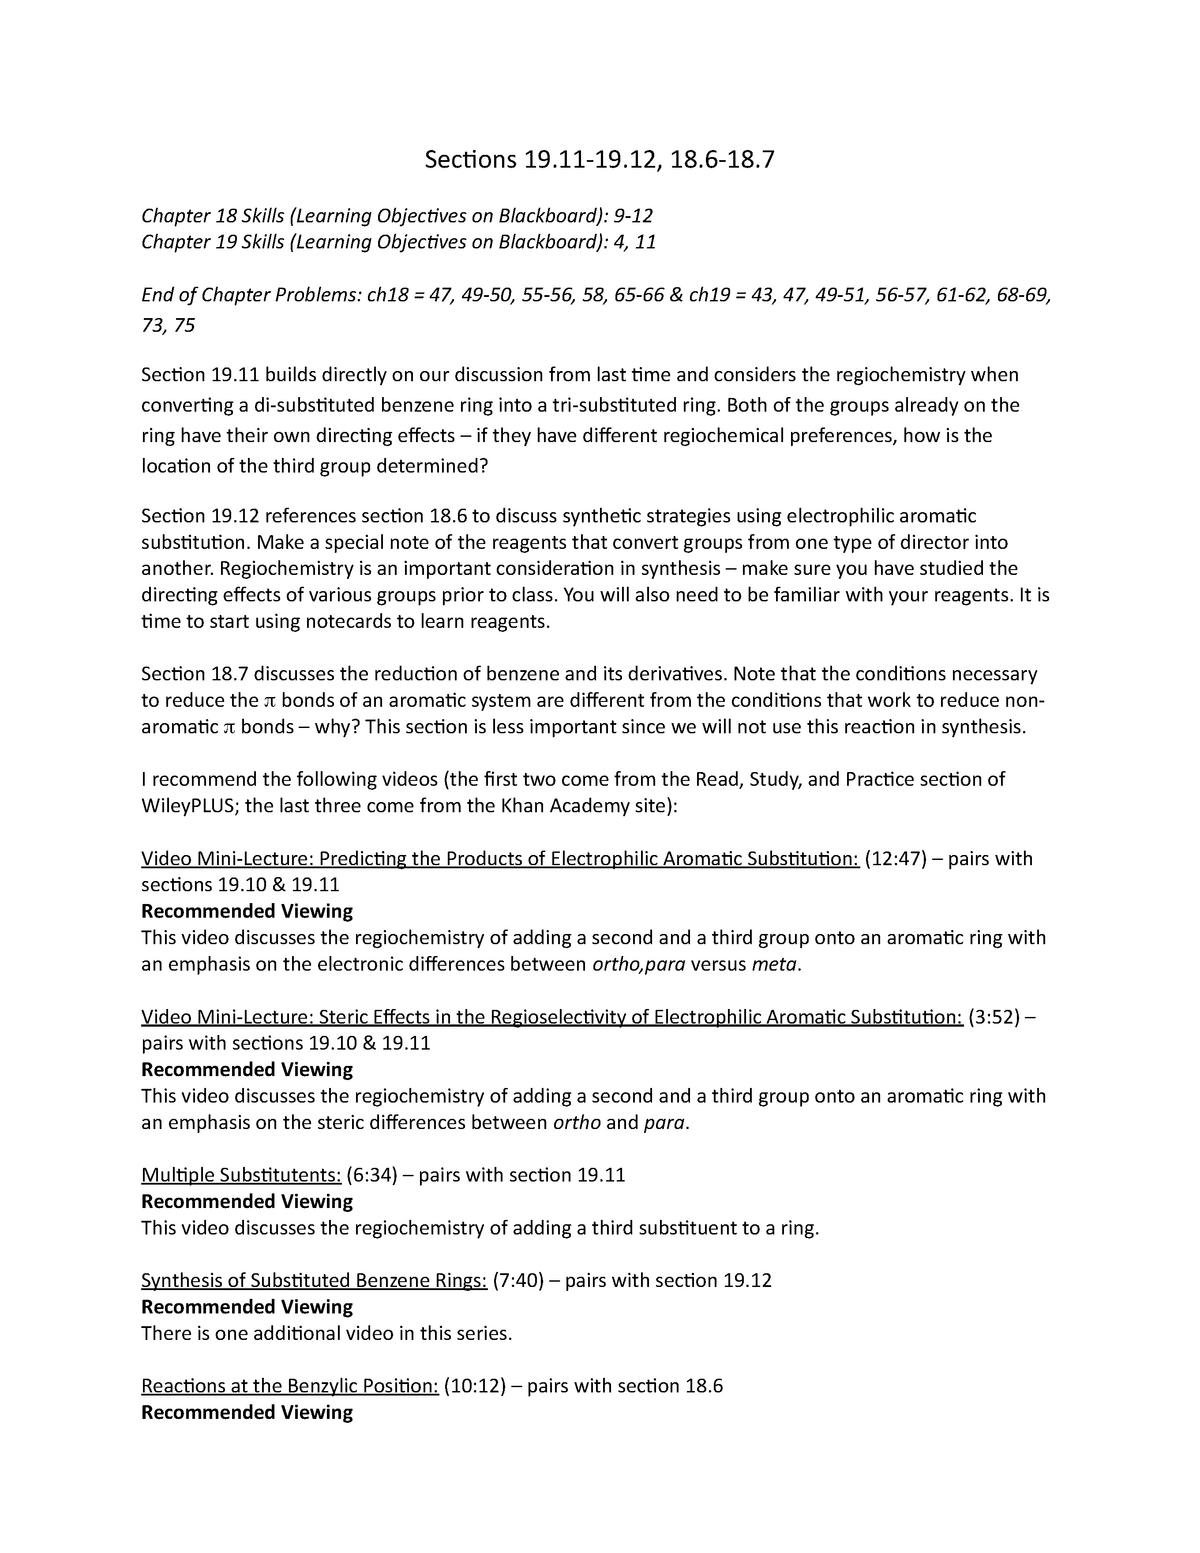 Reading Guide 19-11 19-12 18-6 18-7 - CHEM 351 : Organic